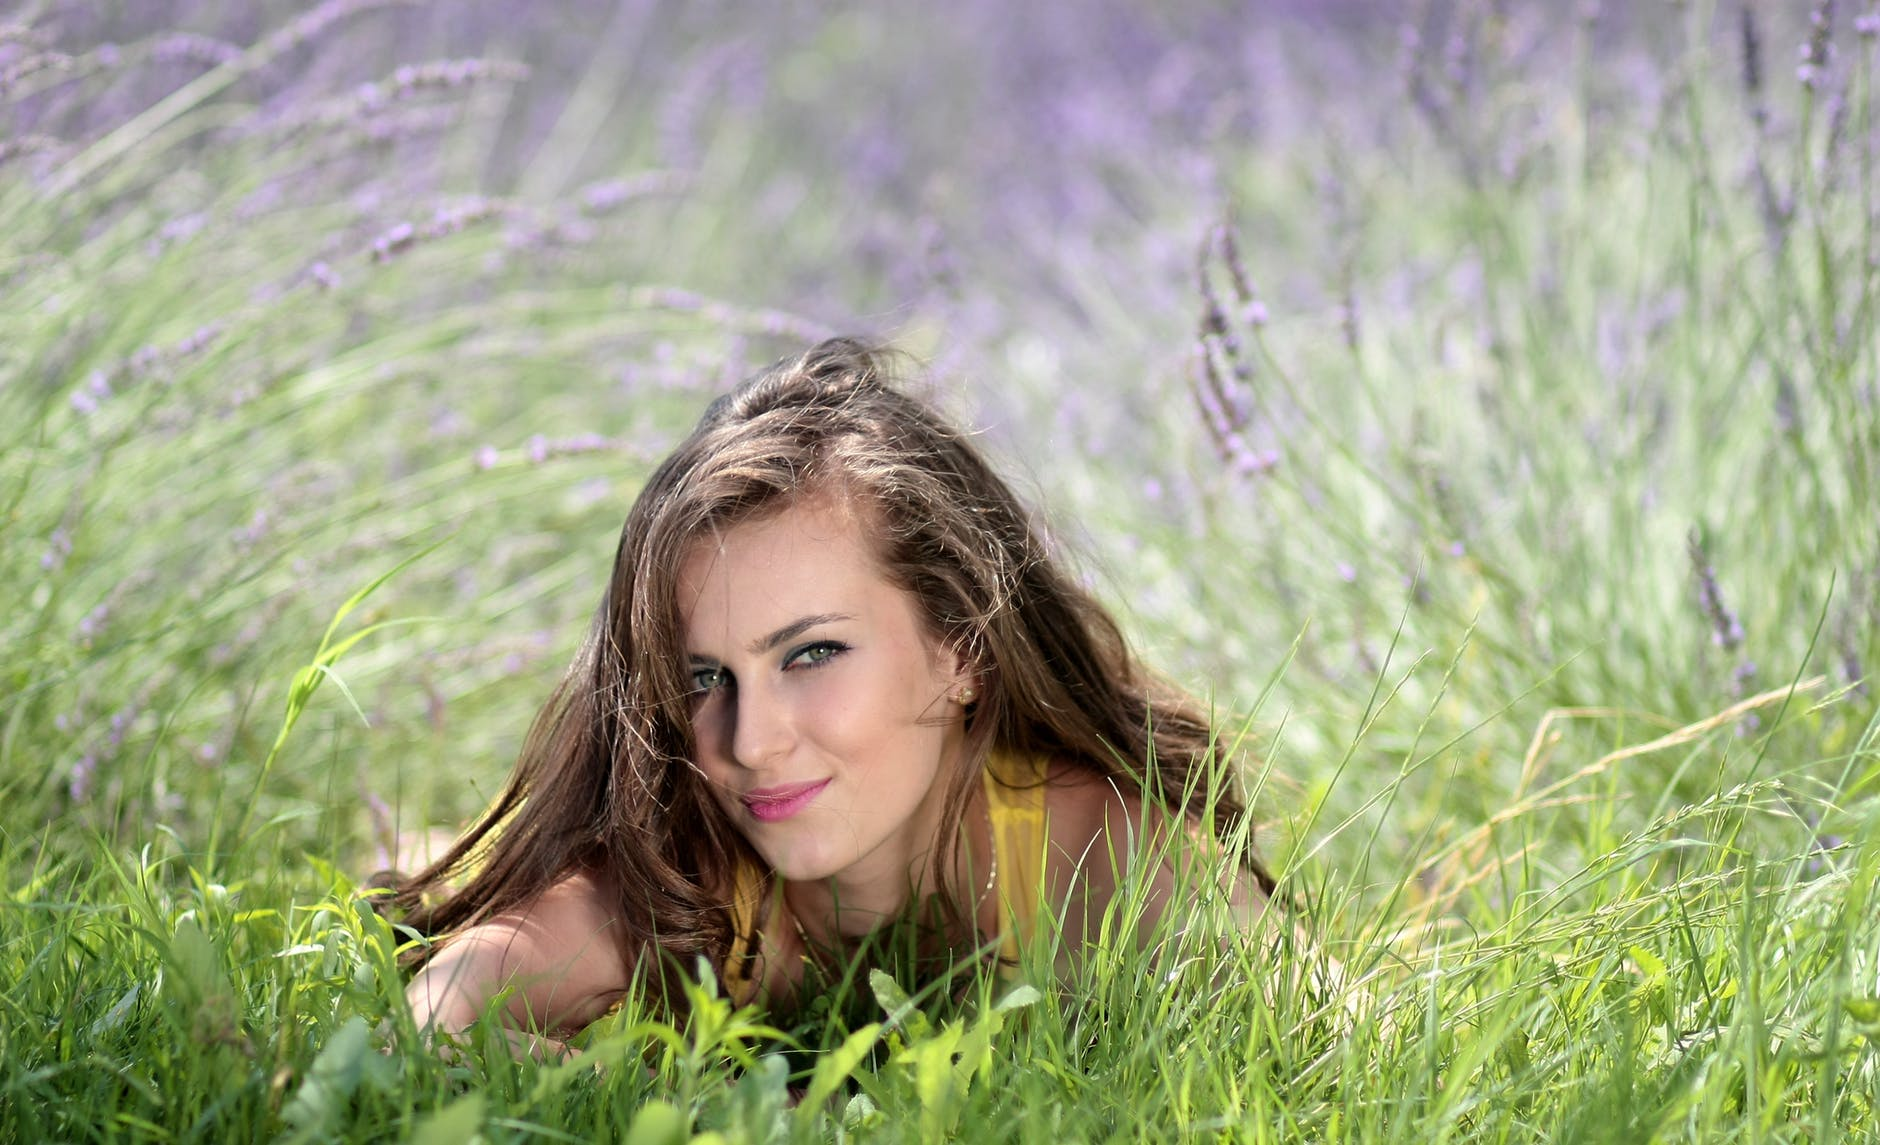 girl-lavender-flowers-mov-116160.jpeg